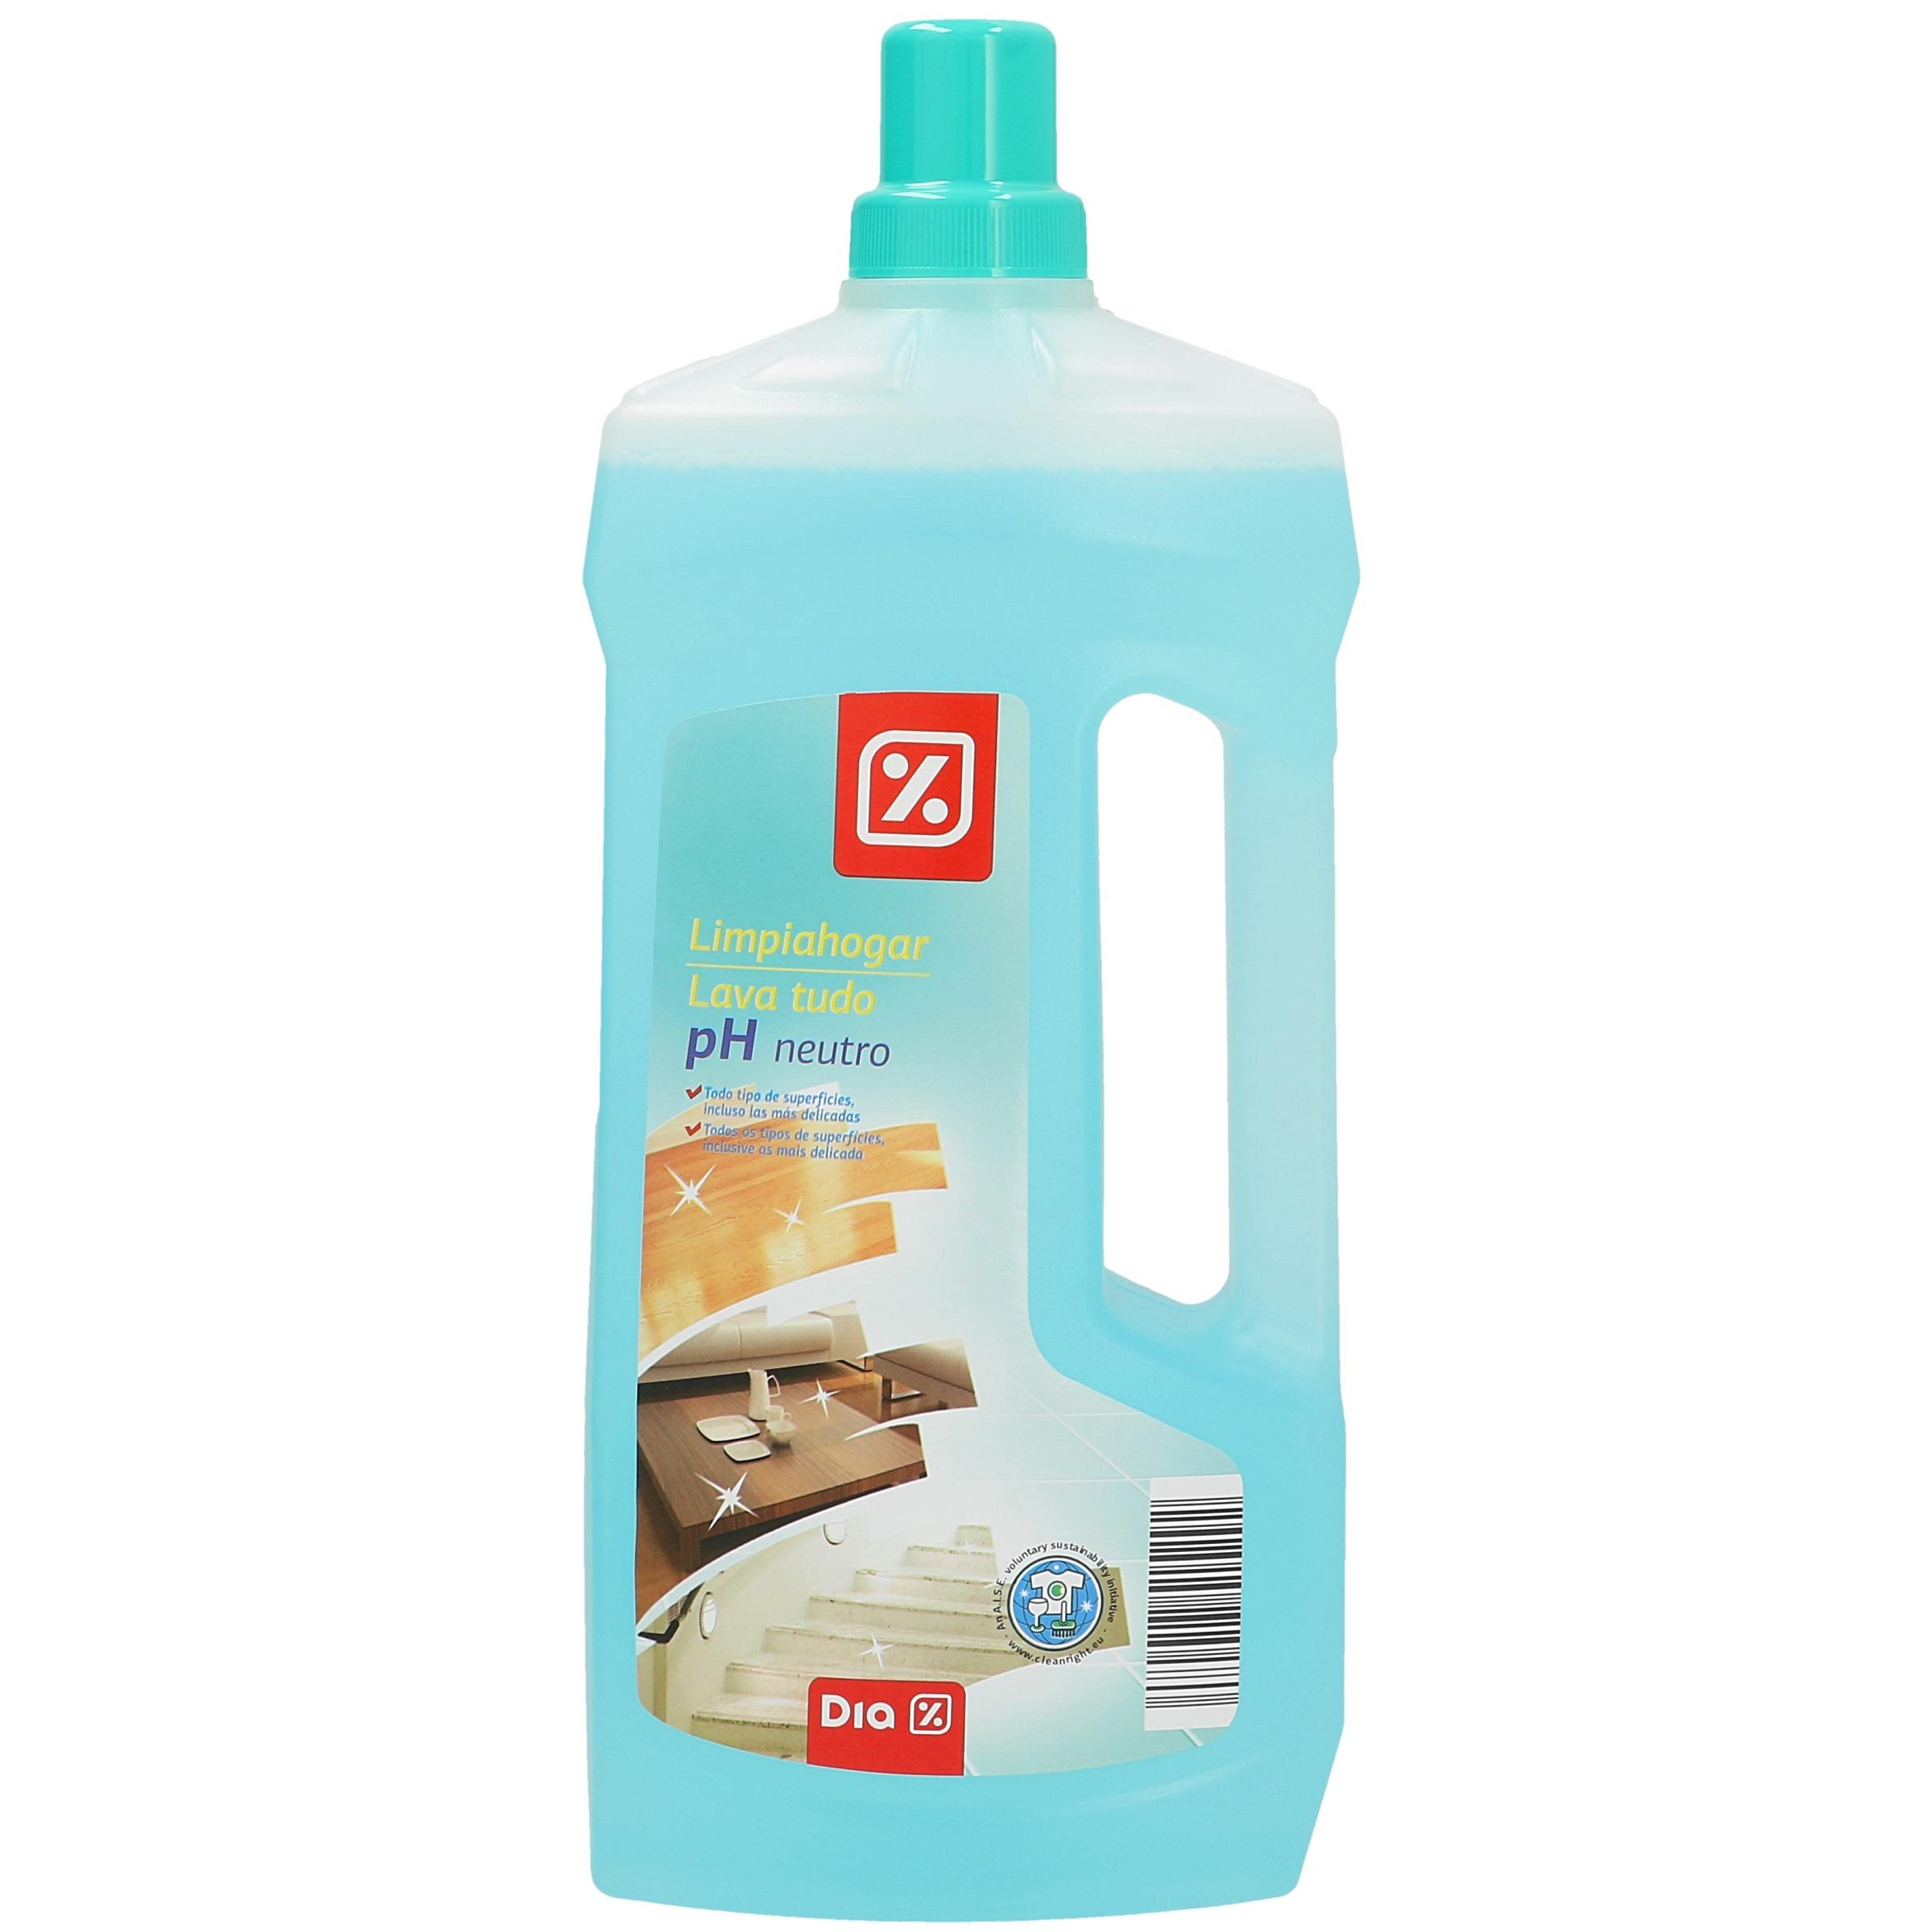 Dia limpiador ph neutro botella 1 5 lt limpiador for Jabon neutro para limpiar